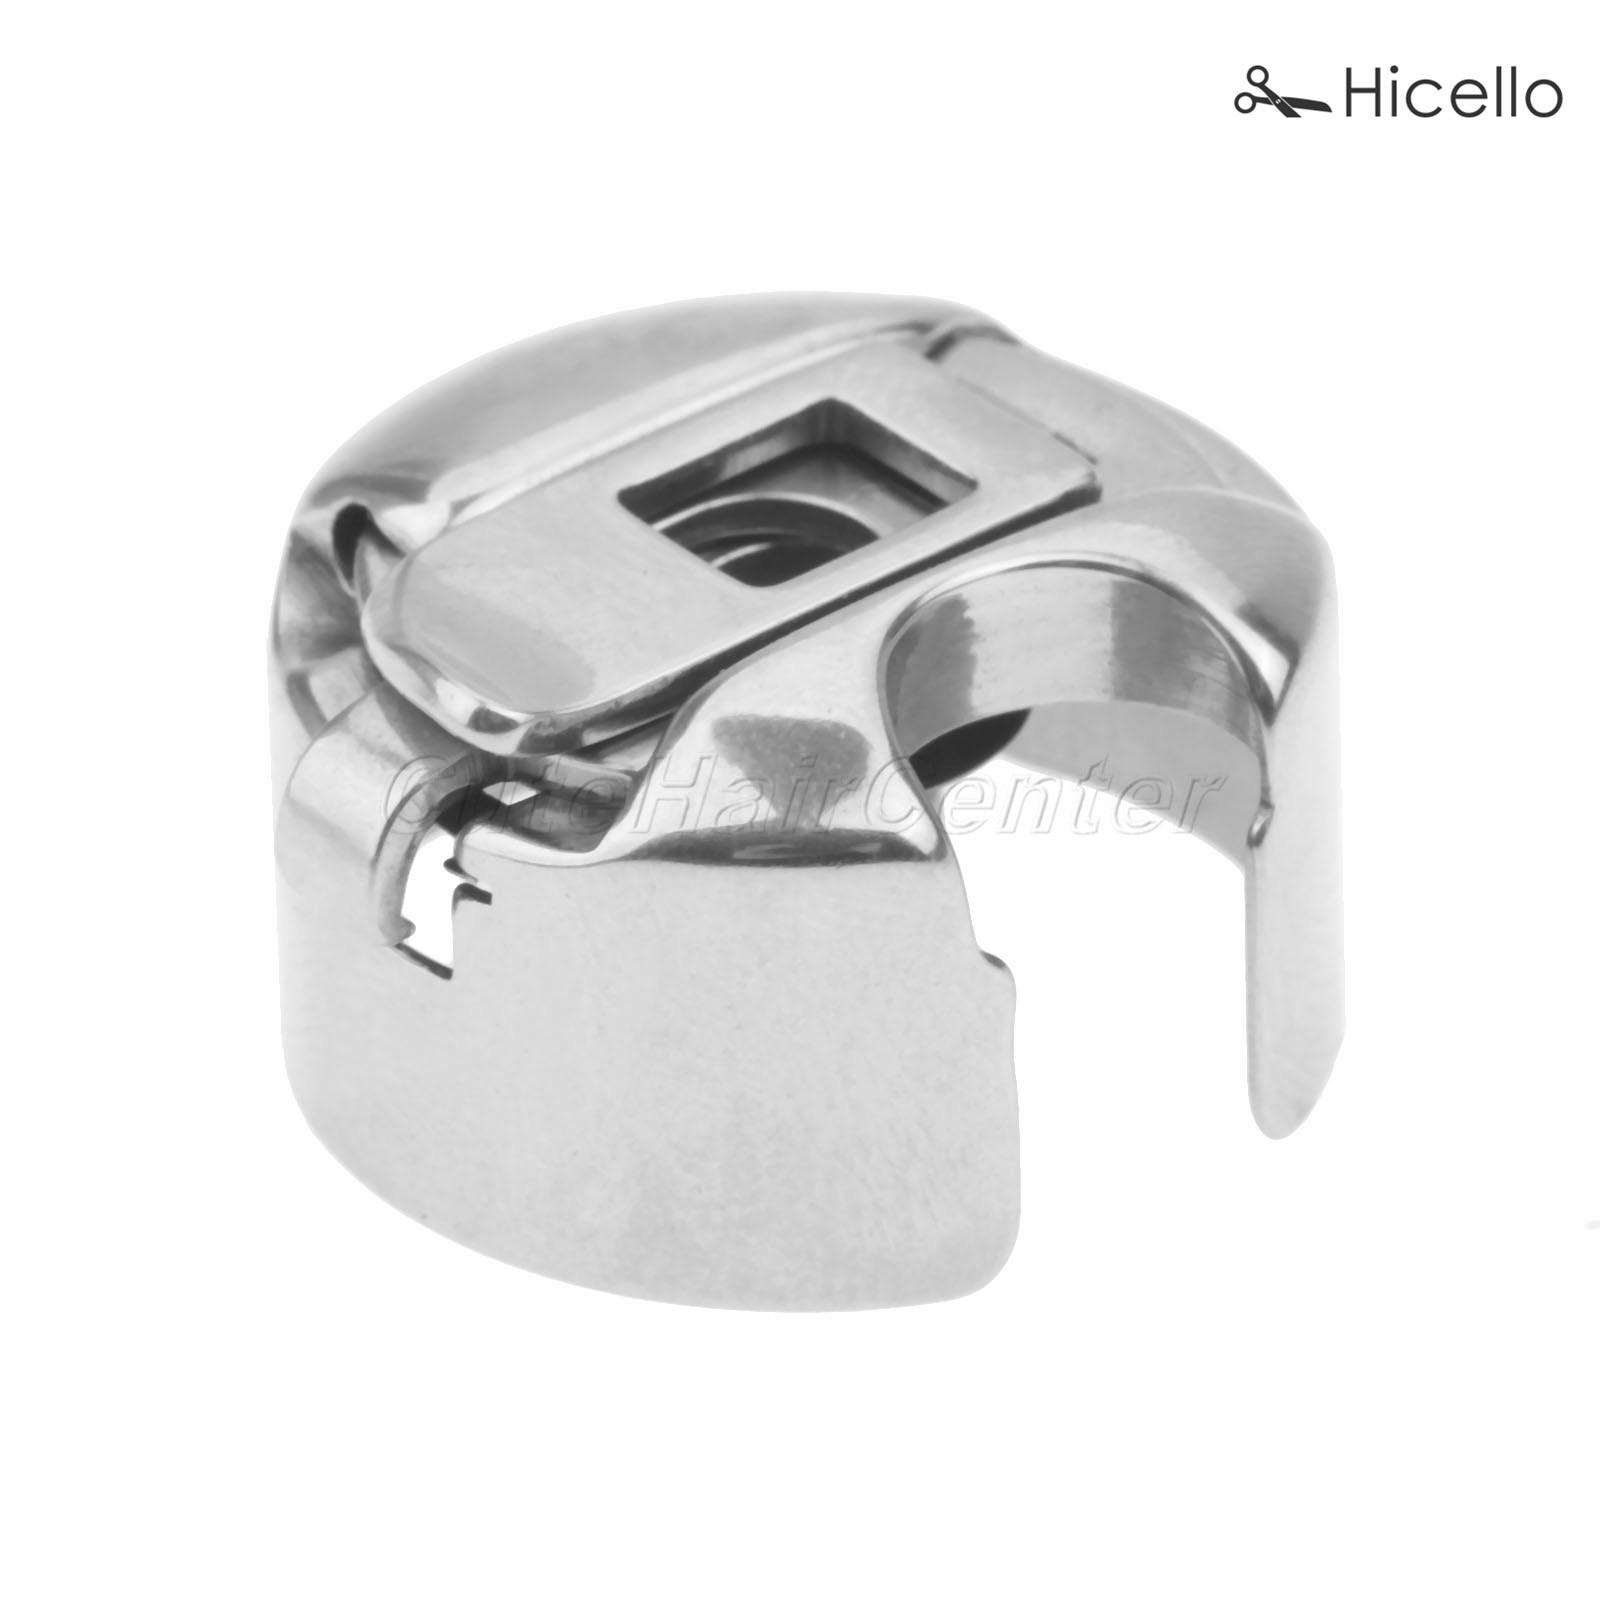 Промышленная швейная машина Bobbin Case сталь серебро 1/8 для lockstitch Brother/SINGER/PFAFF/JUKI/WINSEW/PROSEW машина Hicello